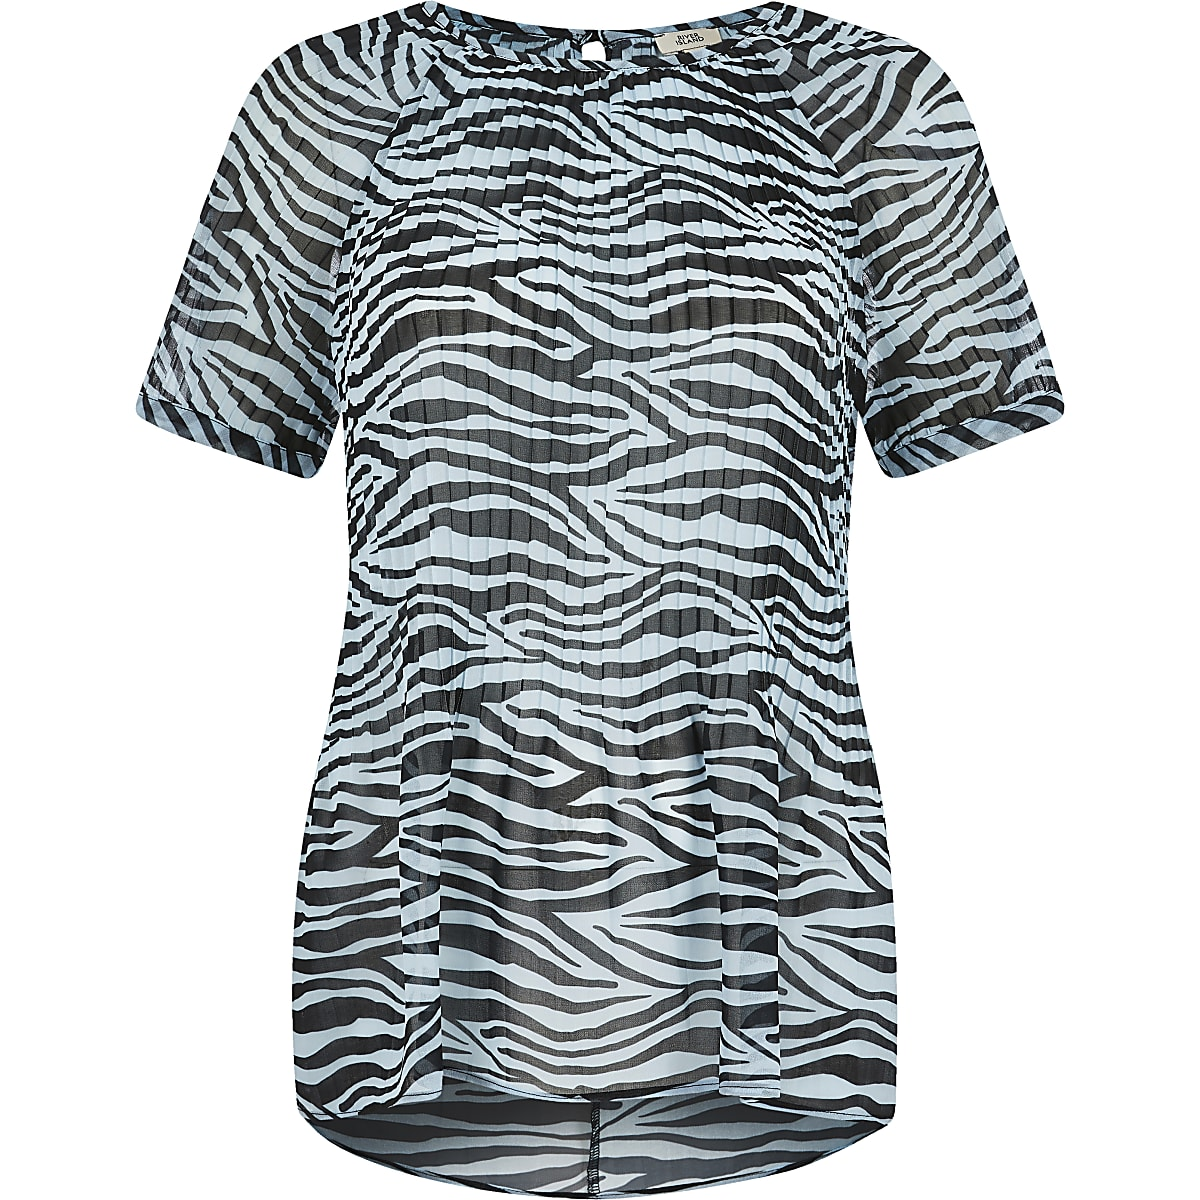 6a573dd450 Blue zebra print plisse top - T-Shirts - Tops - women